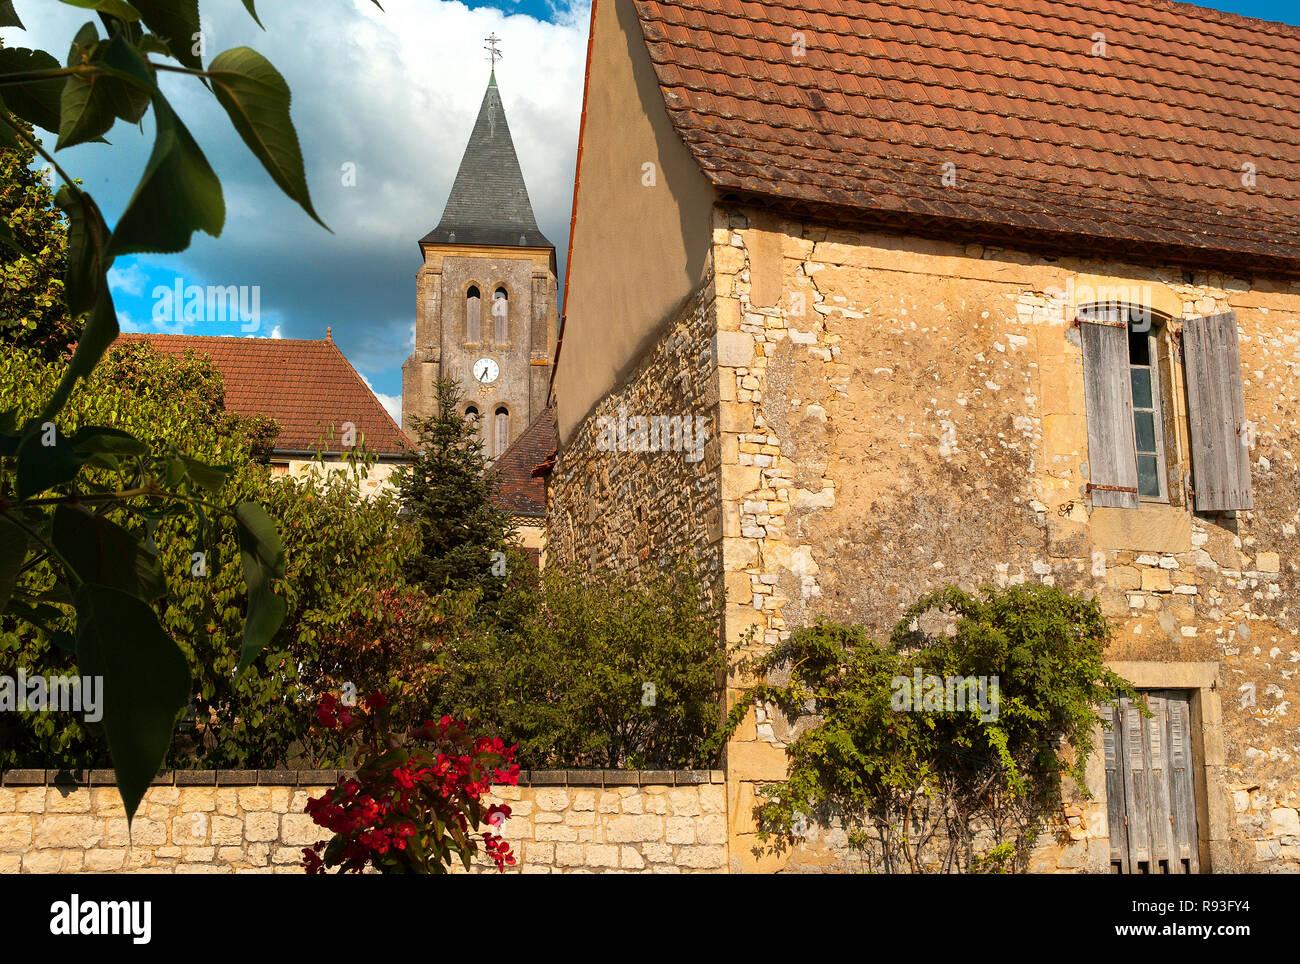 Das Dorf Nabirat, Nouvelle-Aquitaine, Dordogne, Frankreich Stockbild